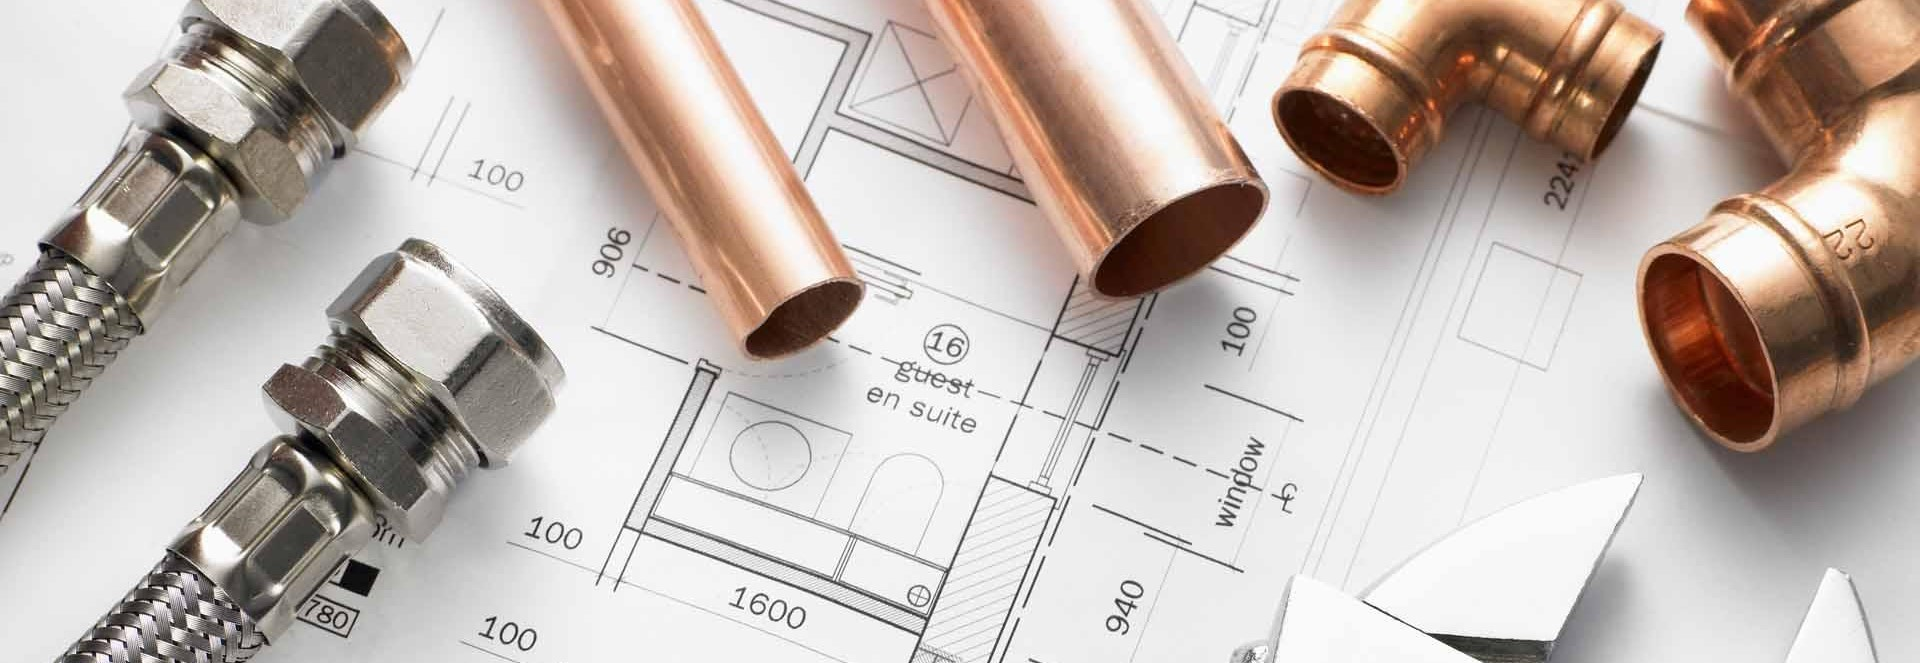 Plombiers - RDG Agence Design